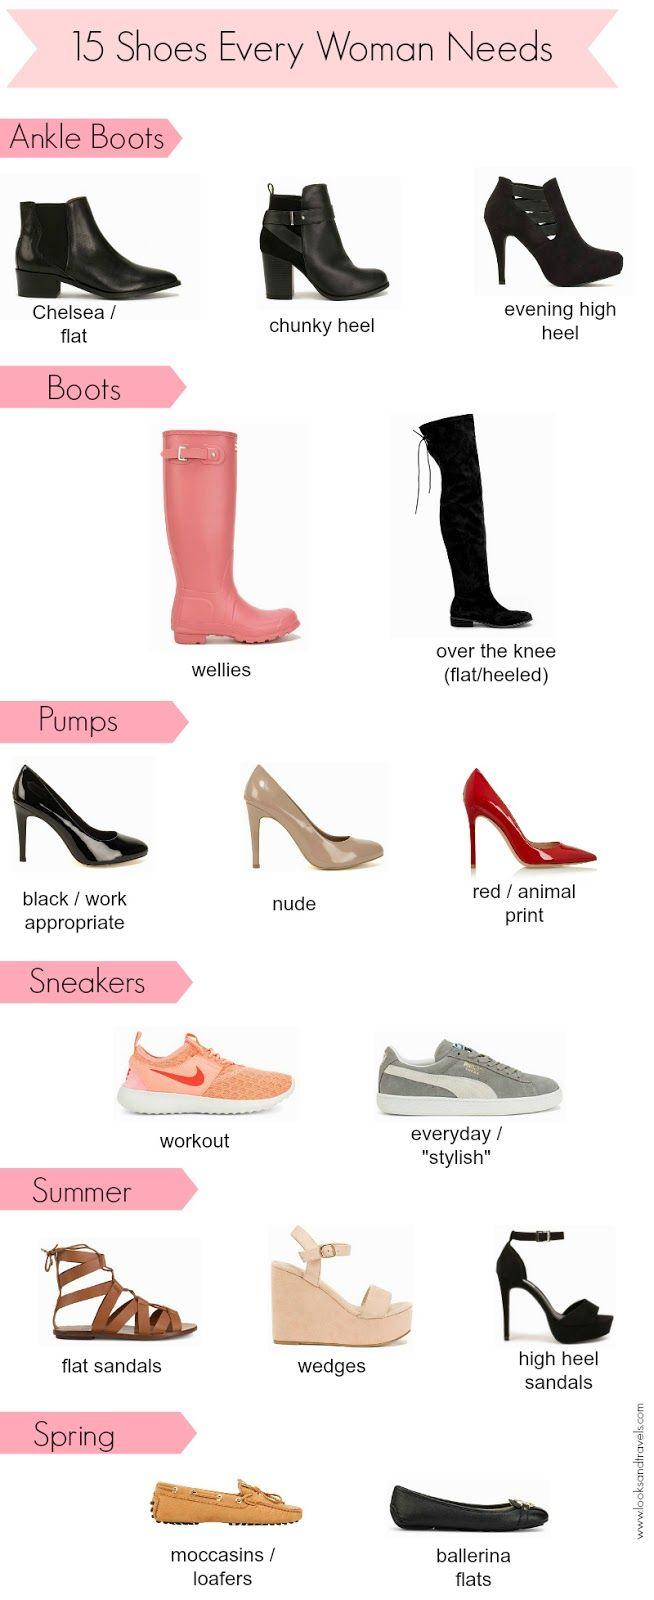 8c girls nike shoes | Nike shoes girls, Nike shoes, Baby